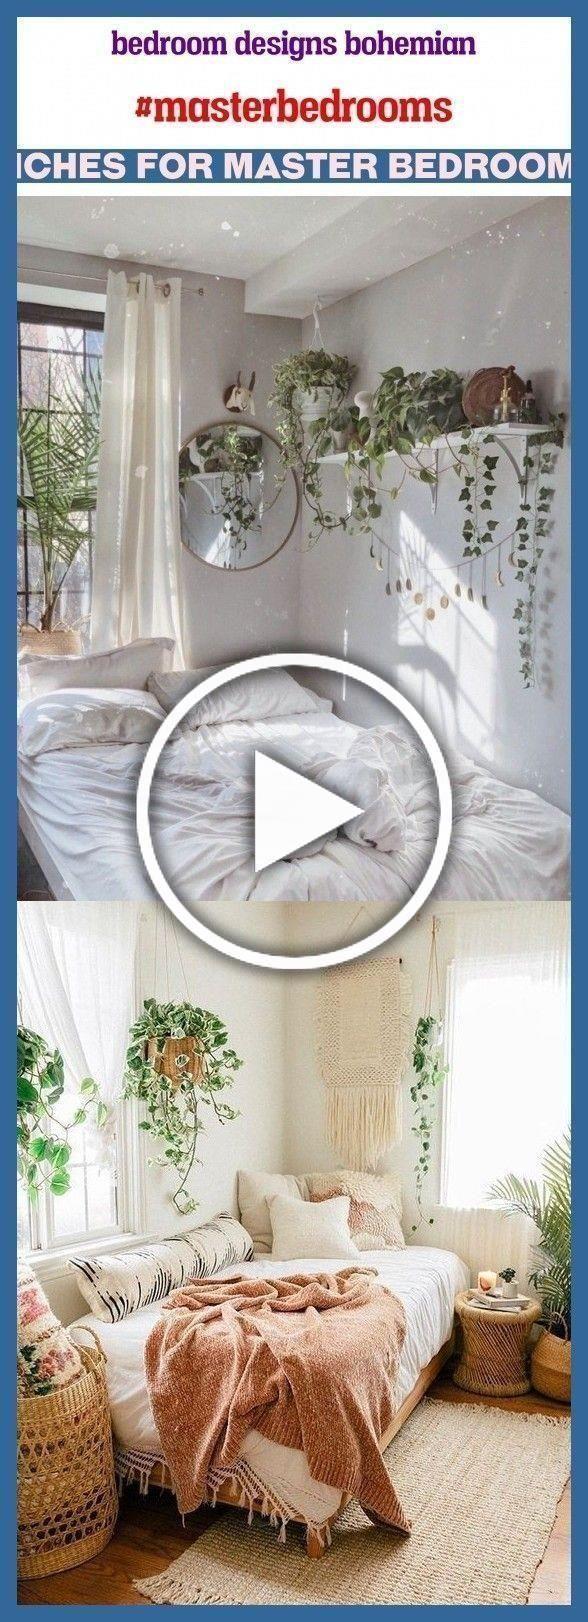 #bedroom ideas master on a budget boho #bedroom ideas for ... on Boho Bedroom Ideas On A Budget  id=25318